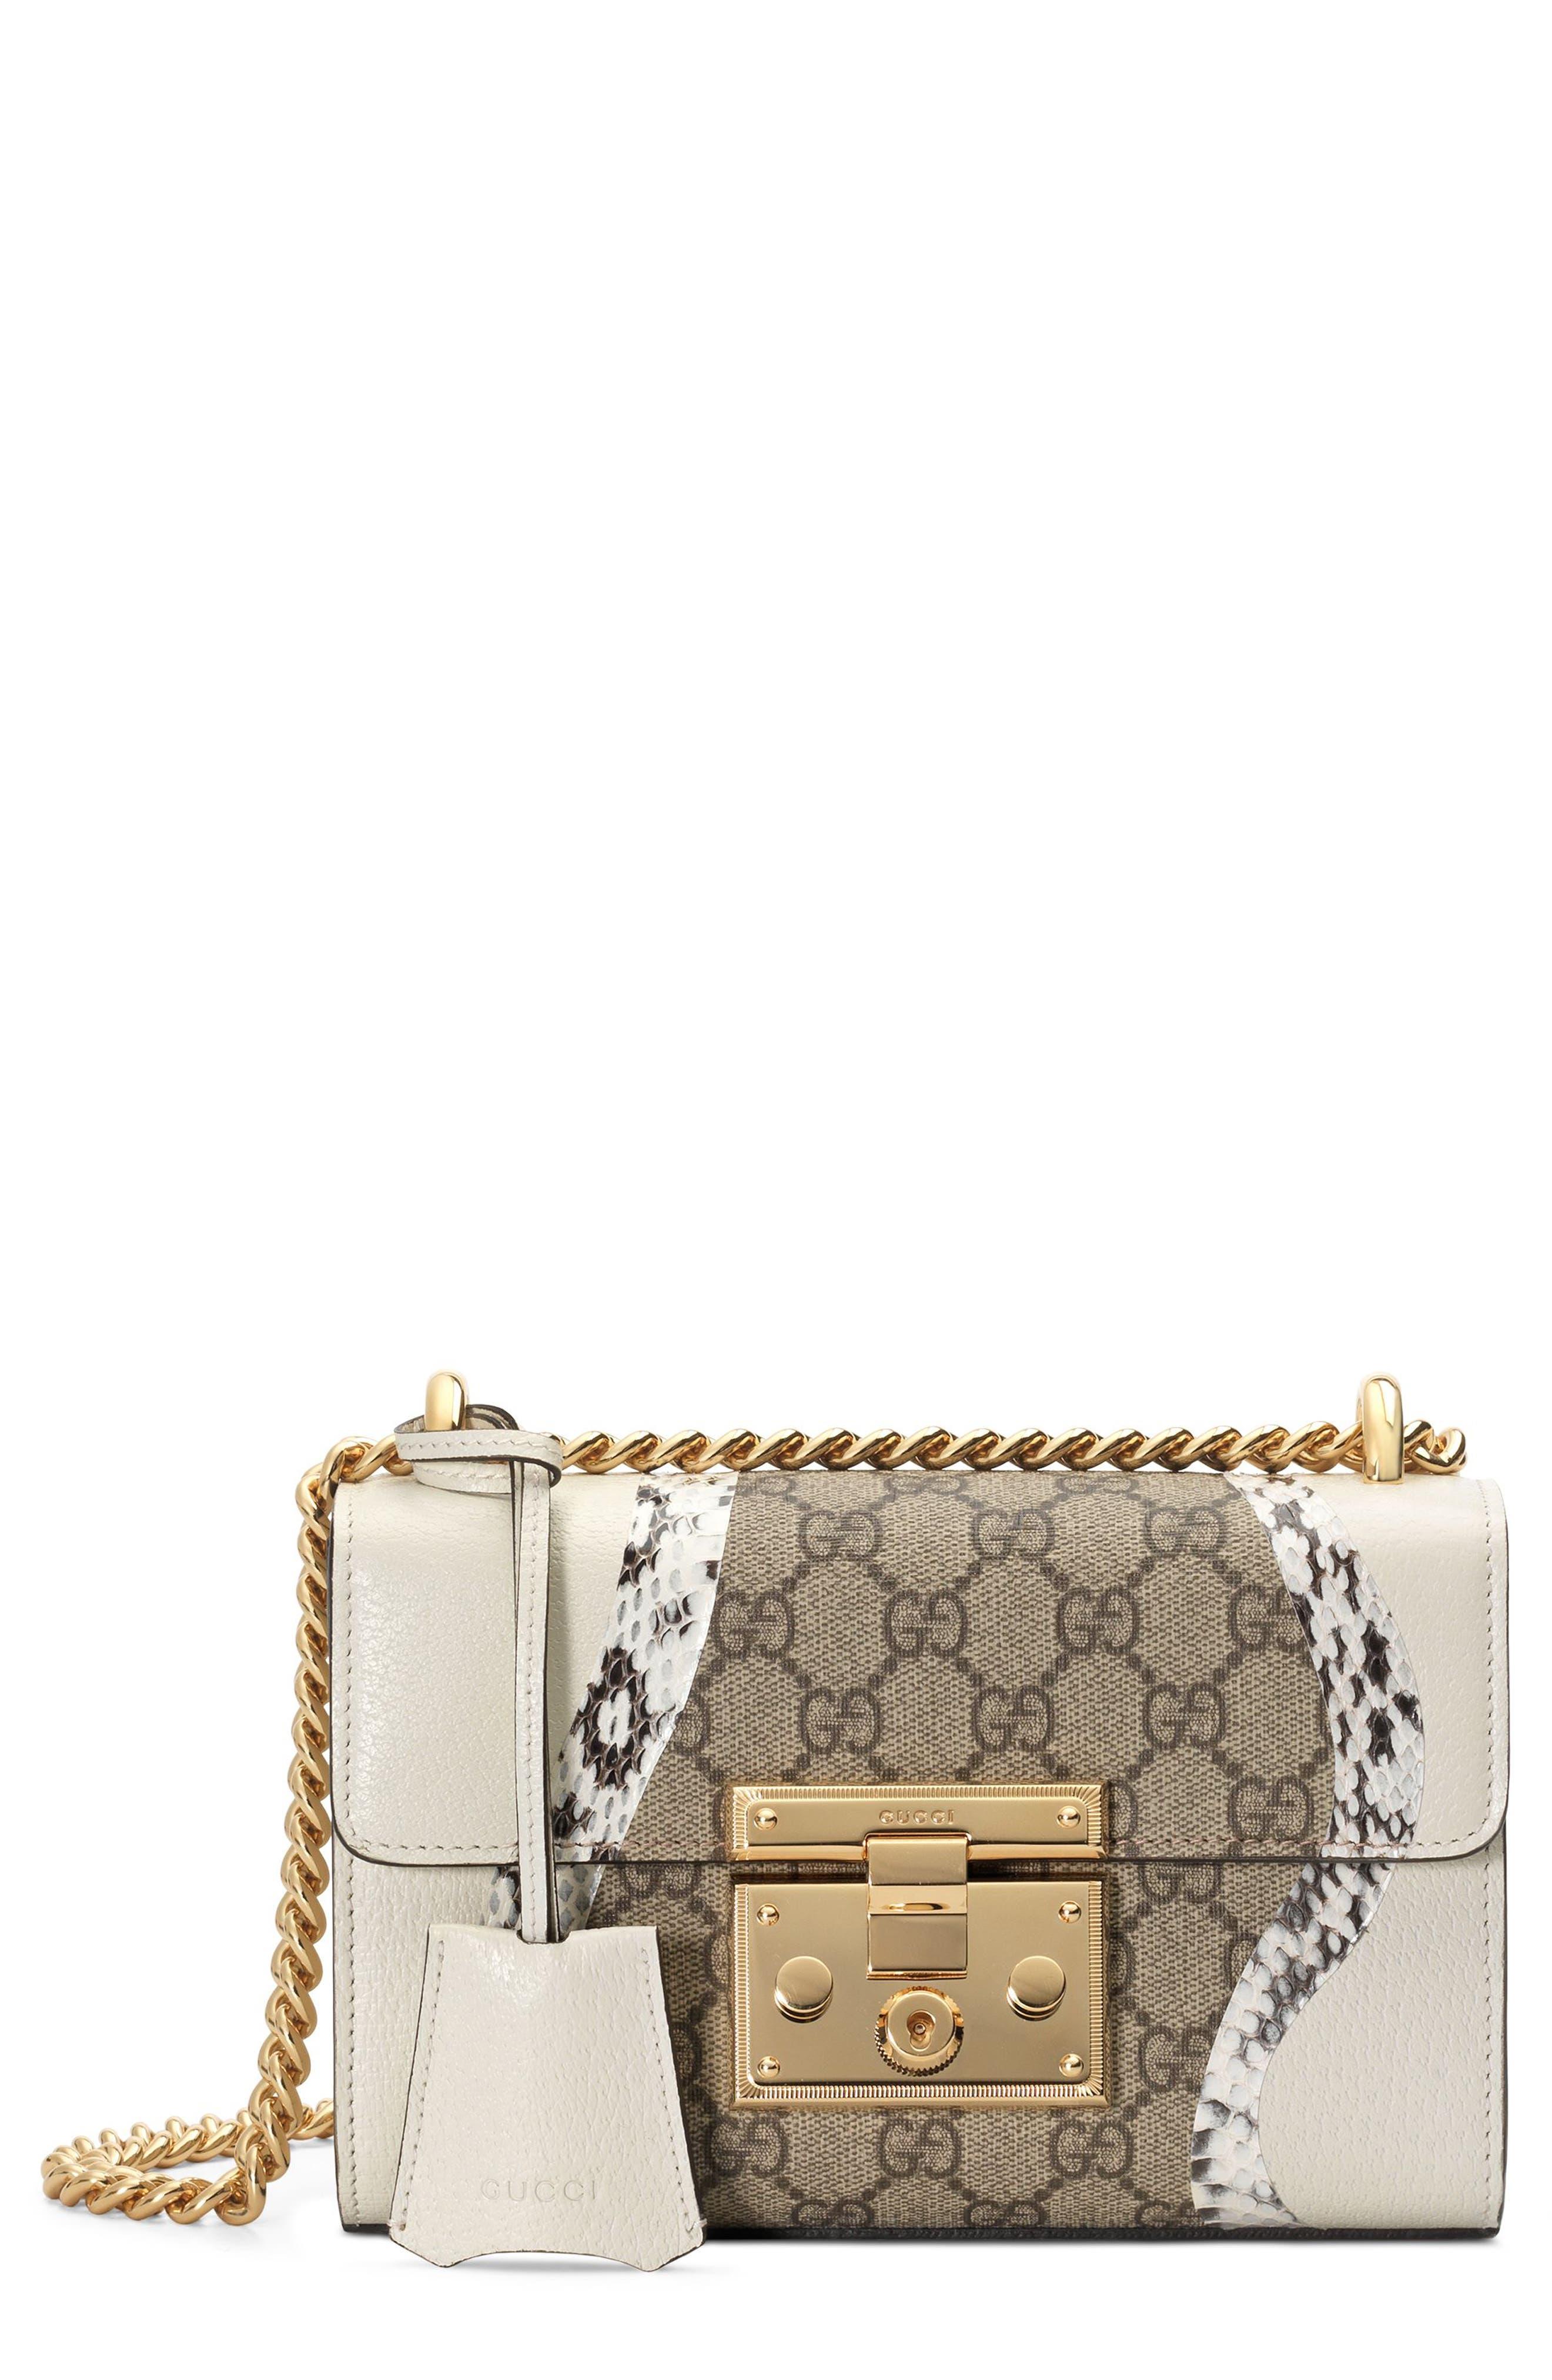 Small Padlock GG Supreme Wave Shoulder Bag with Genuine Snakeskin Trim,                             Main thumbnail 1, color,                             White/ Roccia/ Beige Ebony